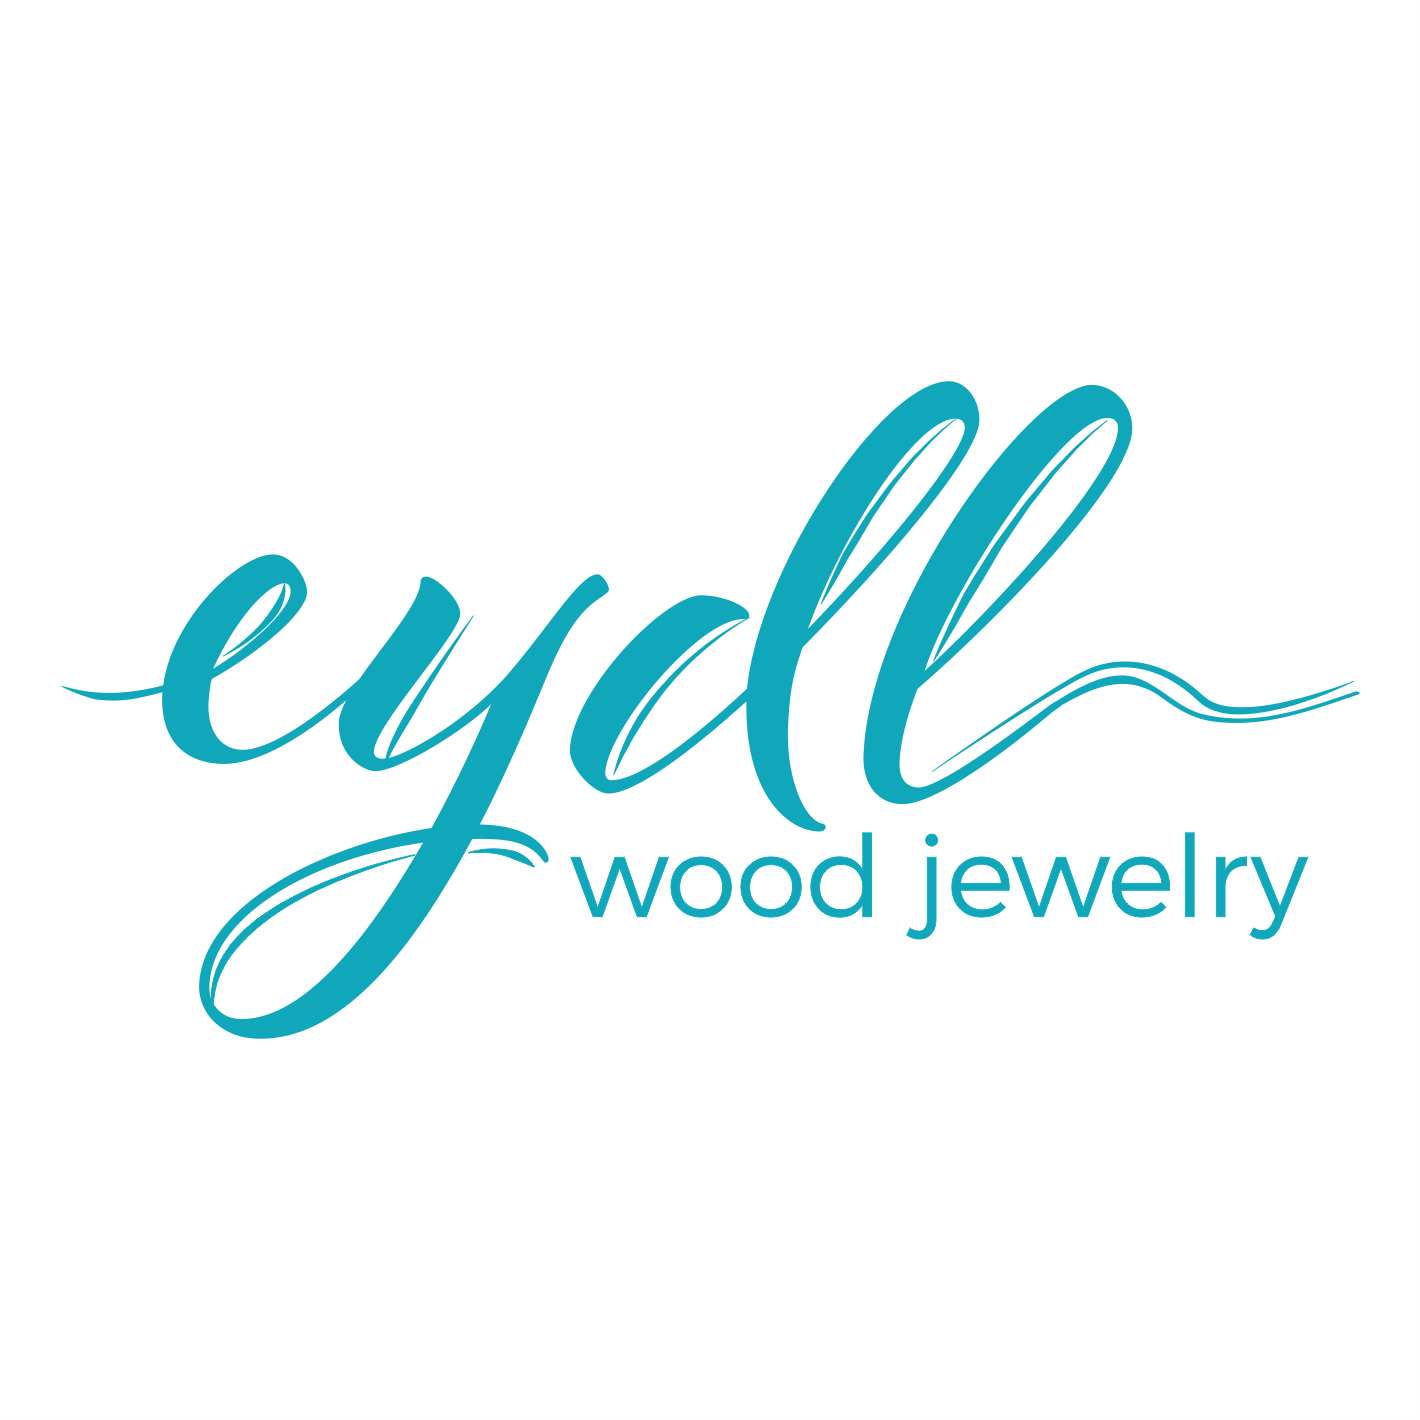 Eydl wood jewelry